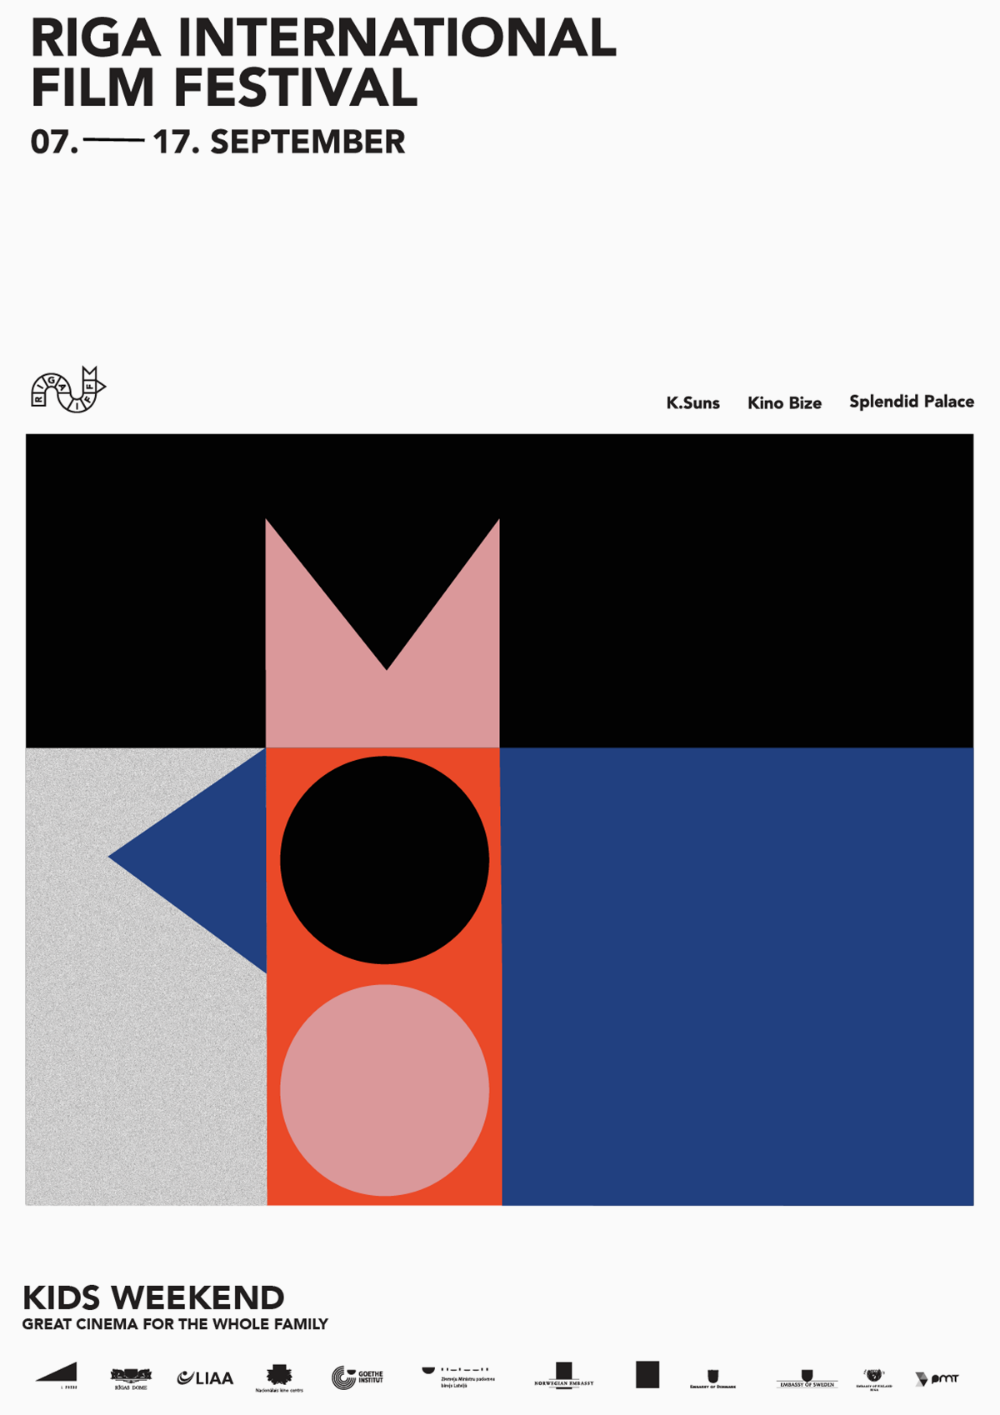 Riga IFF visual identity by «Associates, Partners et Sons